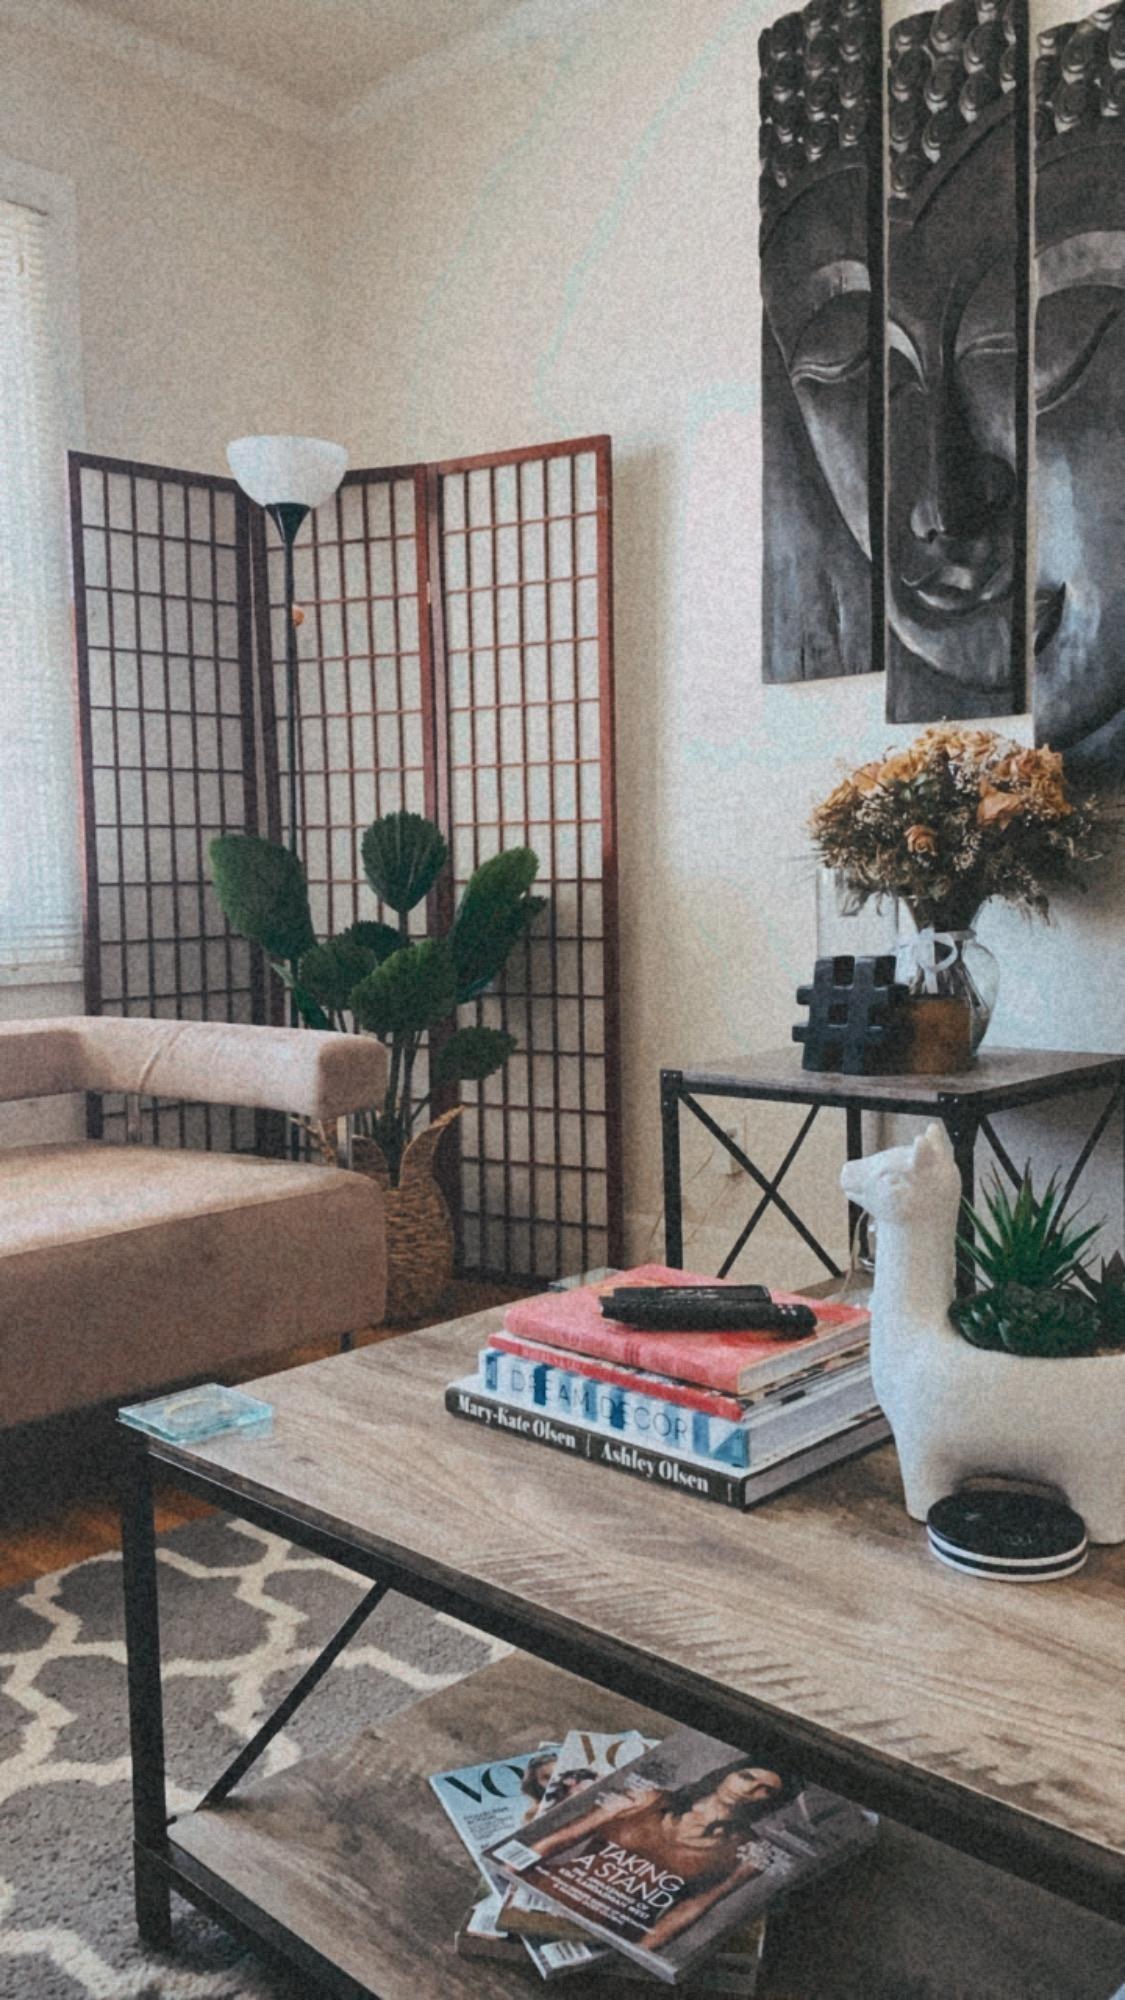 Downtown El Paso Texas Interior Living Space Design Concept Furniture Home Decor Aesthetic Amazing Unique In 2020 Interior Decor Downtown El Paso